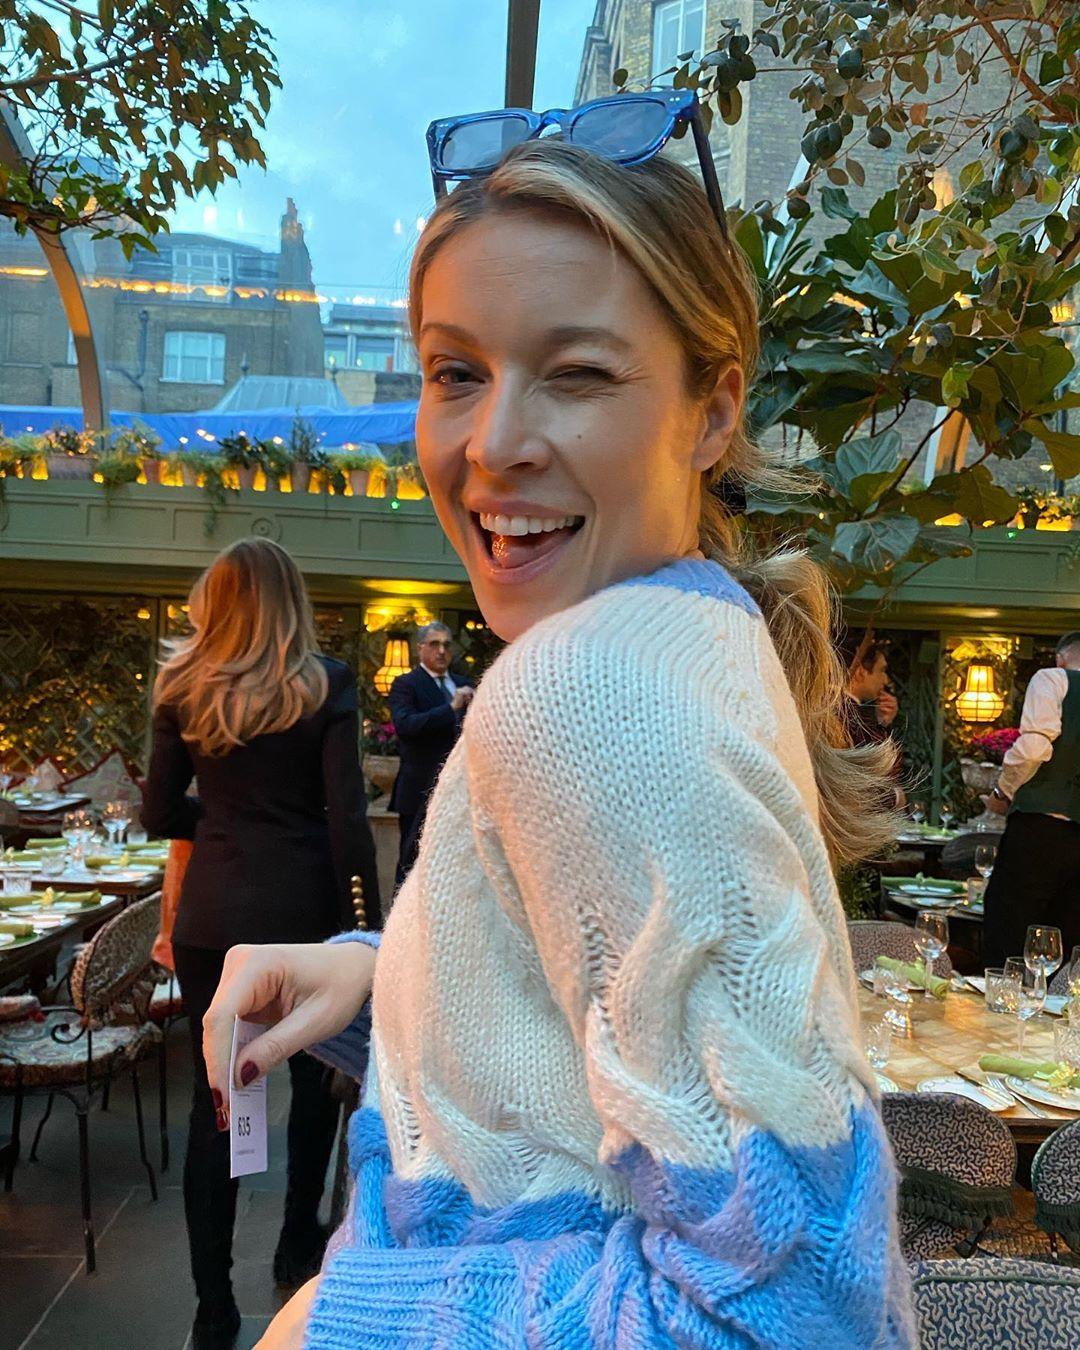 Mαριέττα Χρουσαλά: Με glam look στο Λονδίνο για το show της Celia Kritharioti! Φωτογραφίες